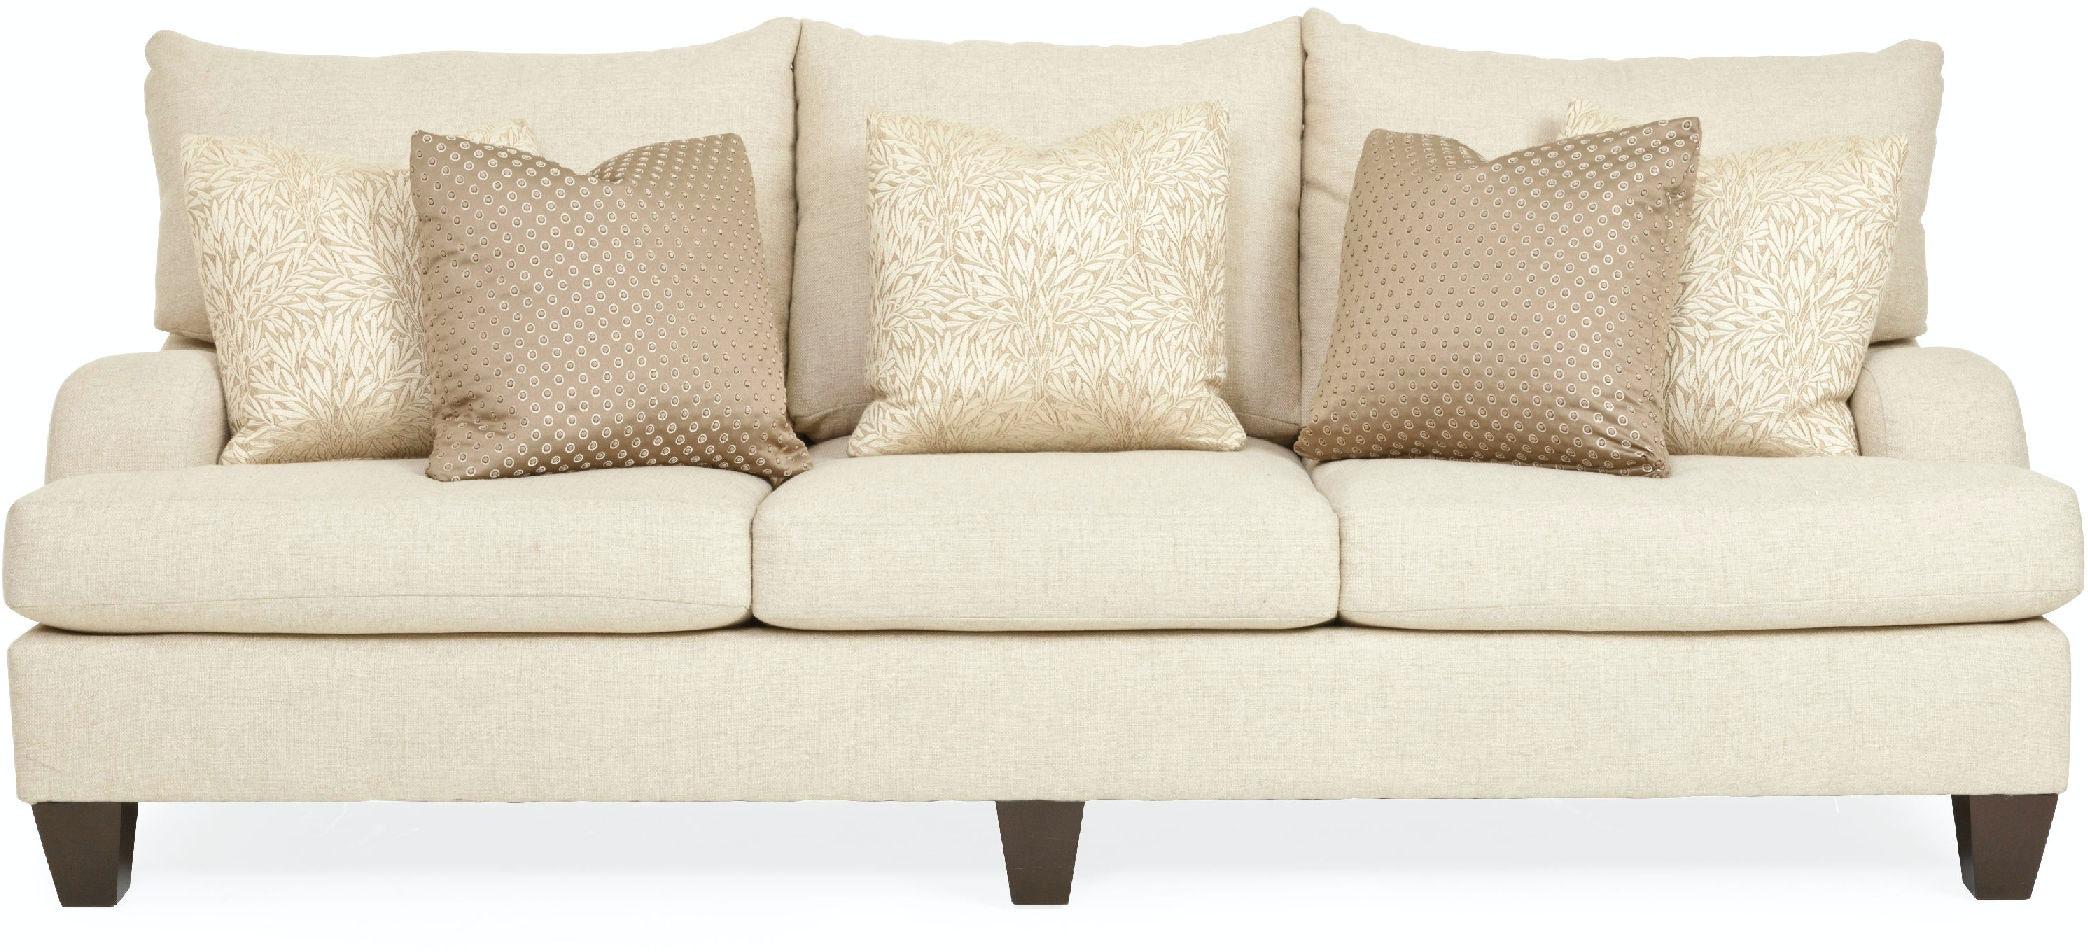 Living Room Sofas Star Furniture Tx Houston Texas ~ Crawford Top-grain Leather Reclining Sofa